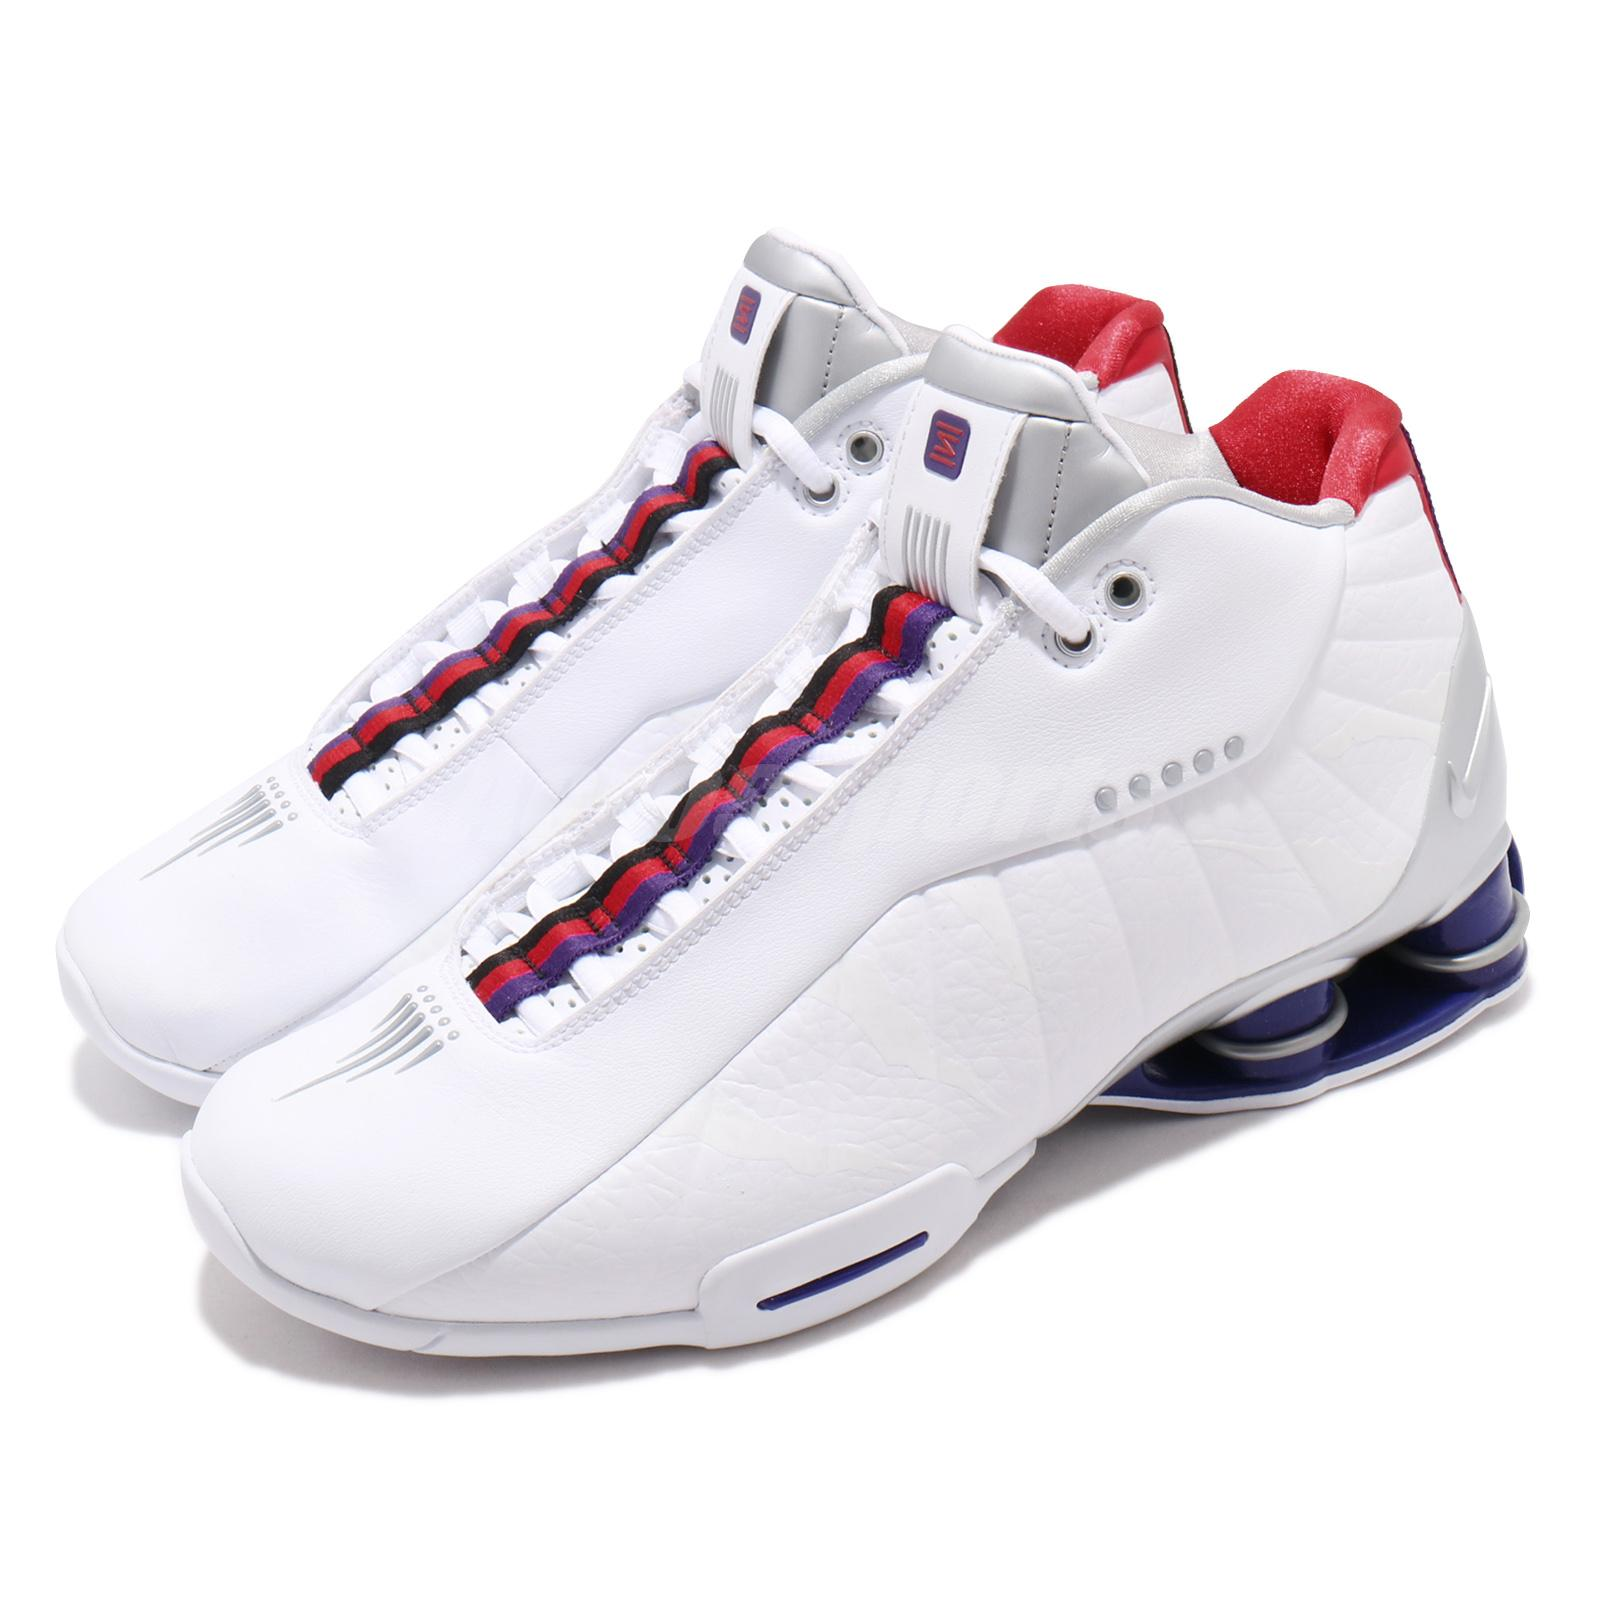 Nike Shox BB4 Raptors Vince Carter